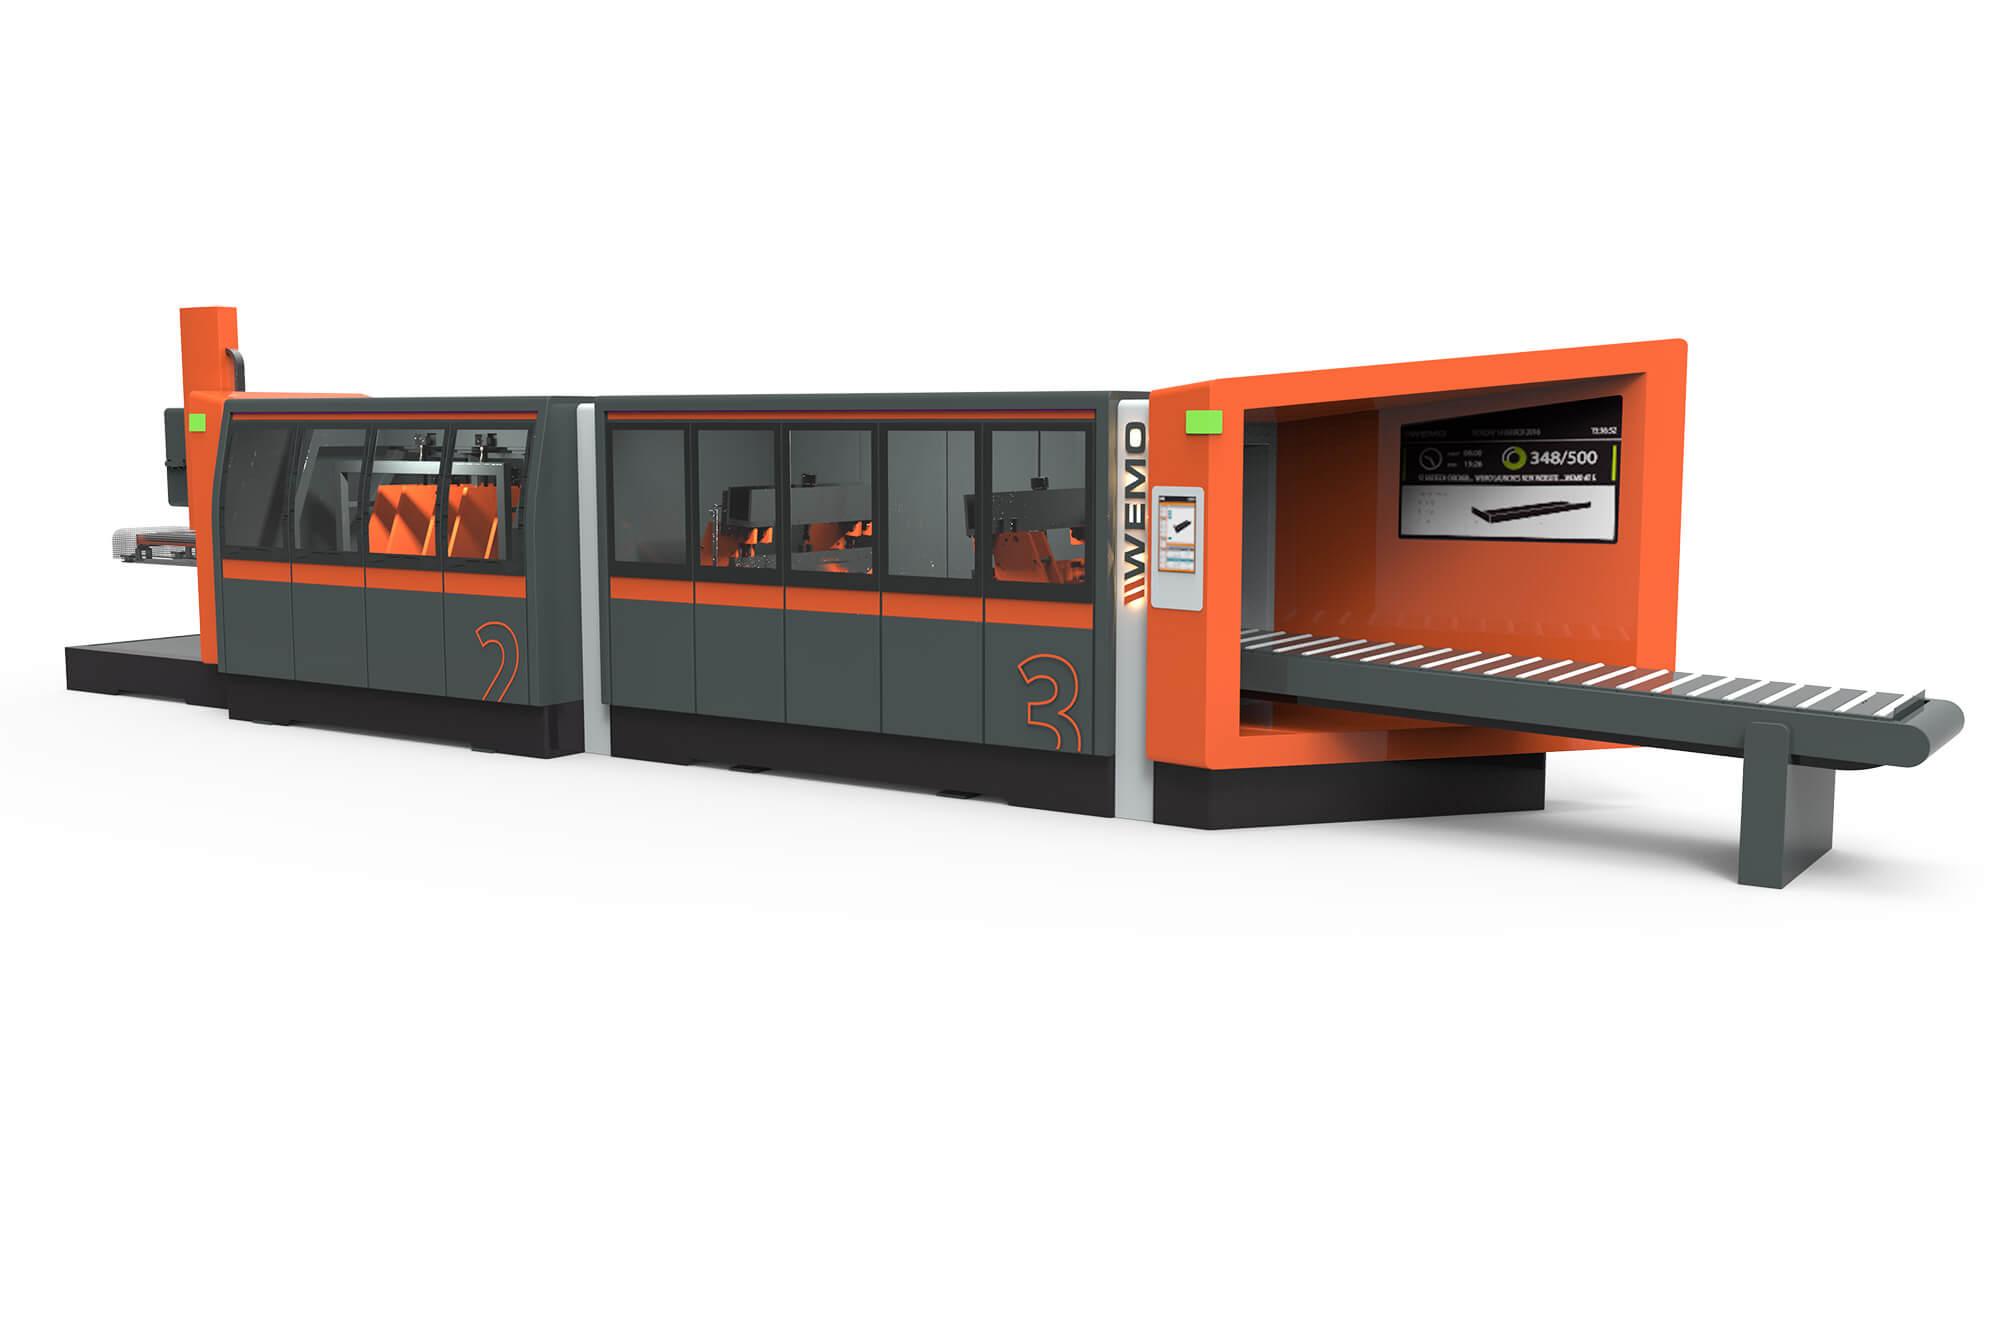 Nieuw WEMO machine design